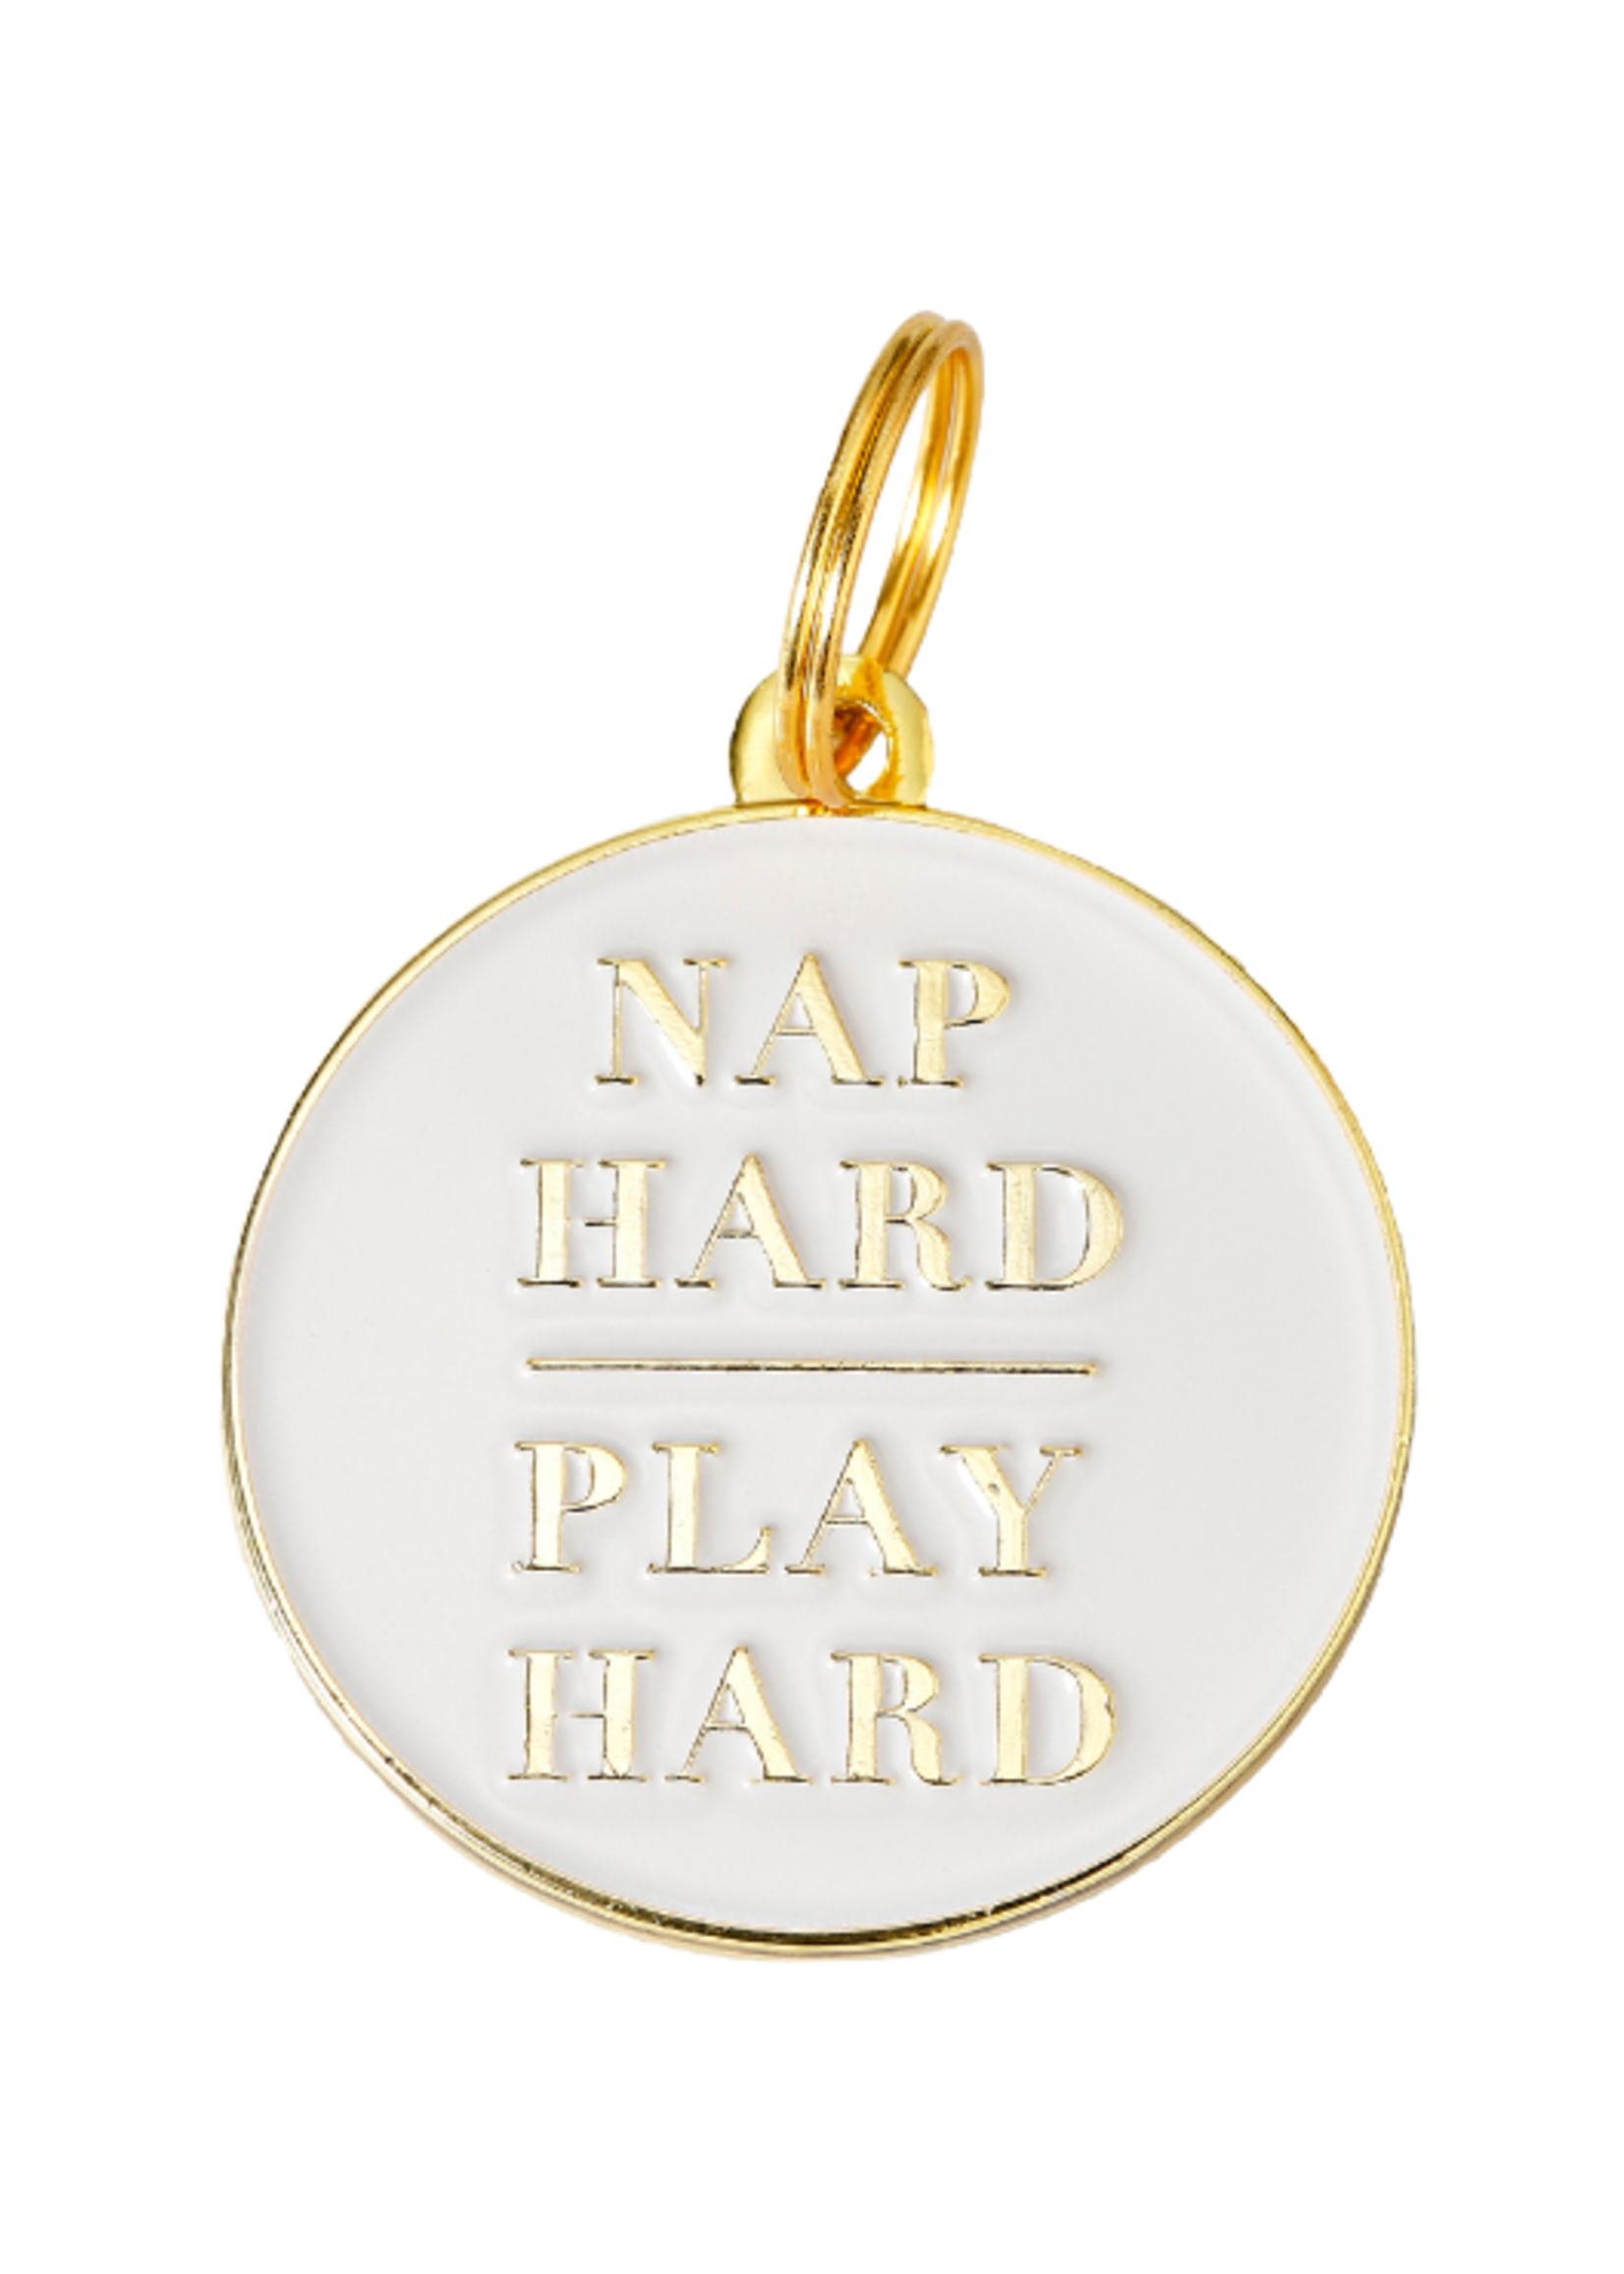 Two Tails Pet Company Nap Hard Play Hard